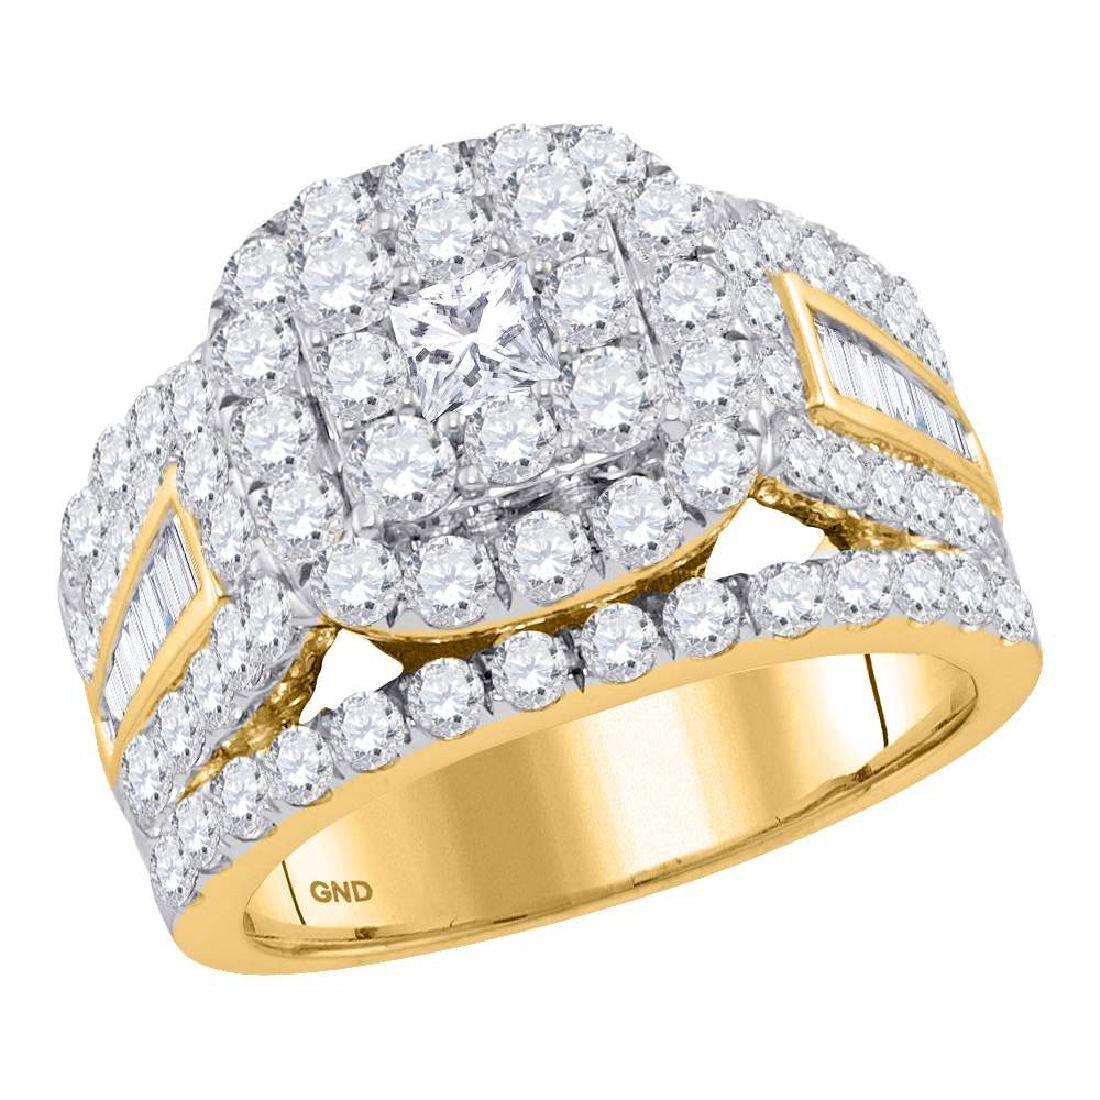 3.01 CTW Princess Diamond Solitaire Halo Bridal